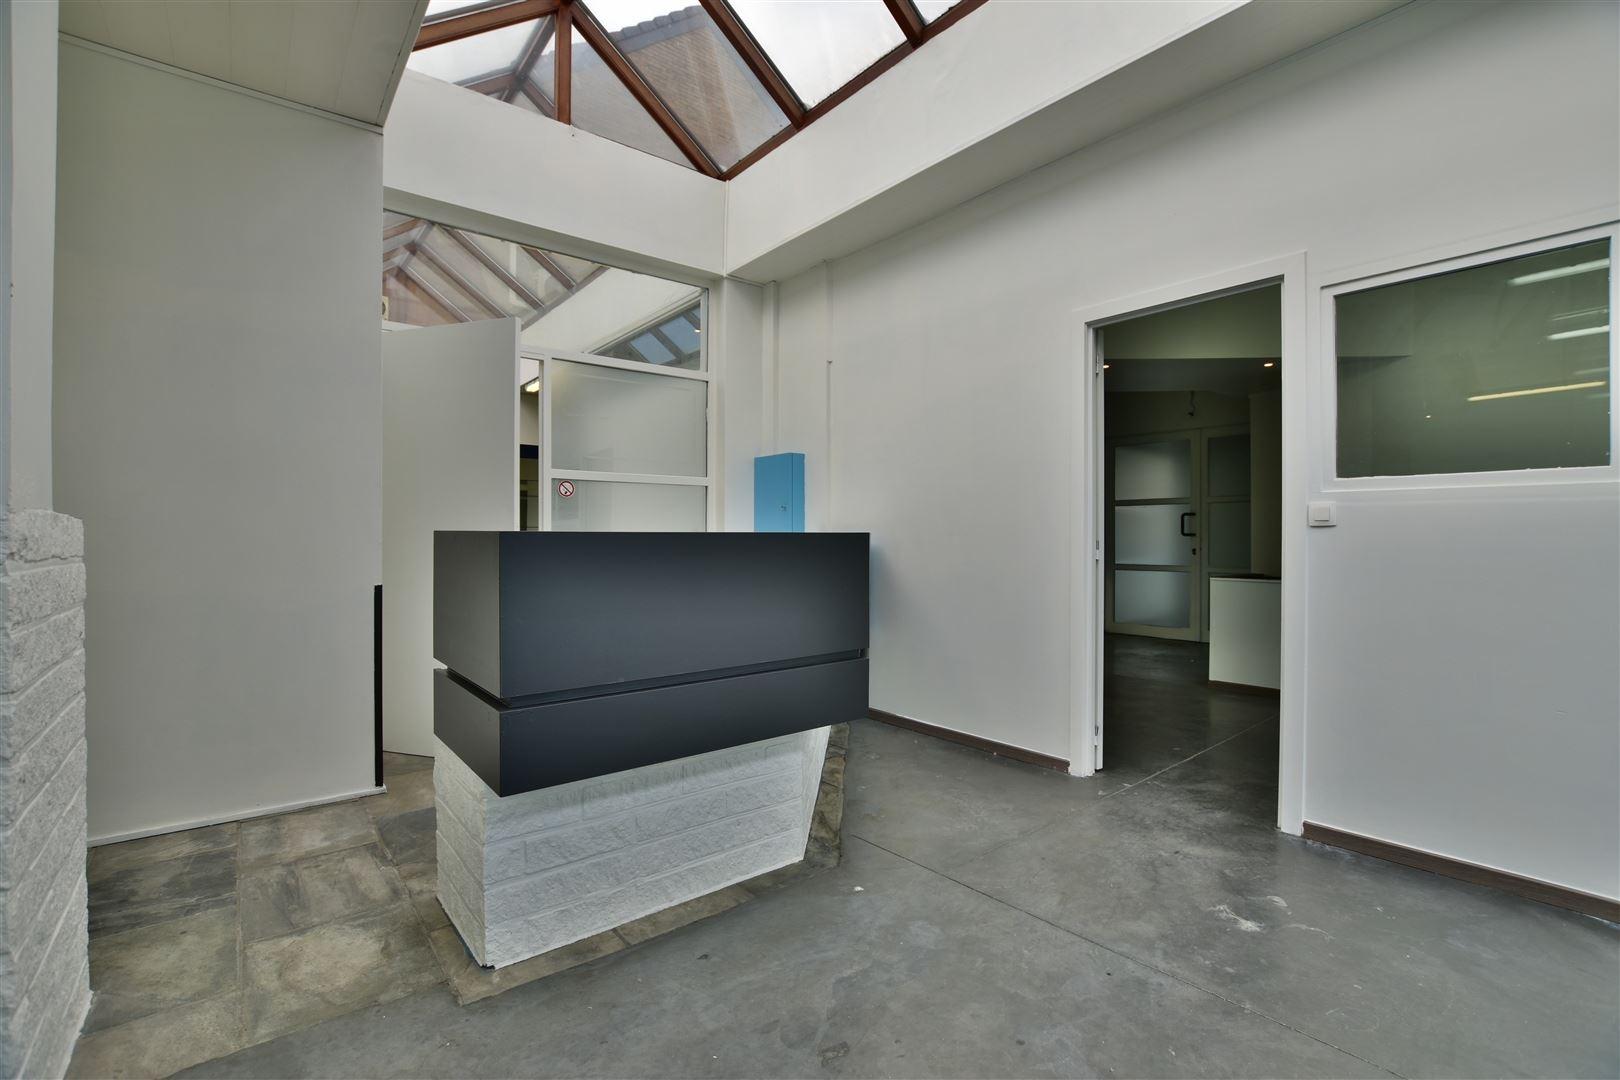 Foto 8 : Kantoorruimte te 9220 HAMME (België) - Prijs € 1.600